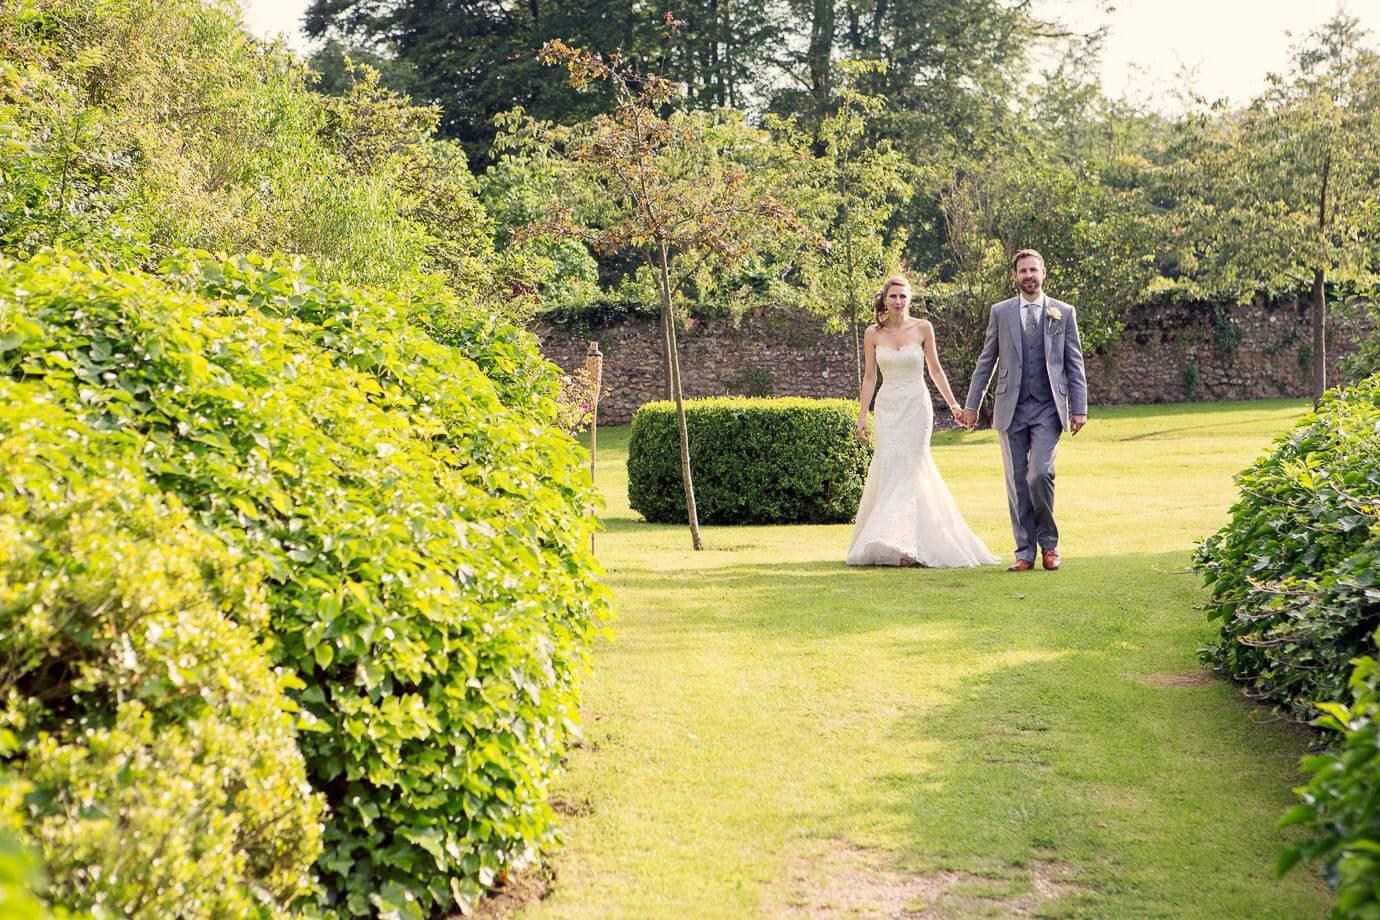 Plush Manor wedding photographers capture bride and groom walking in gardens